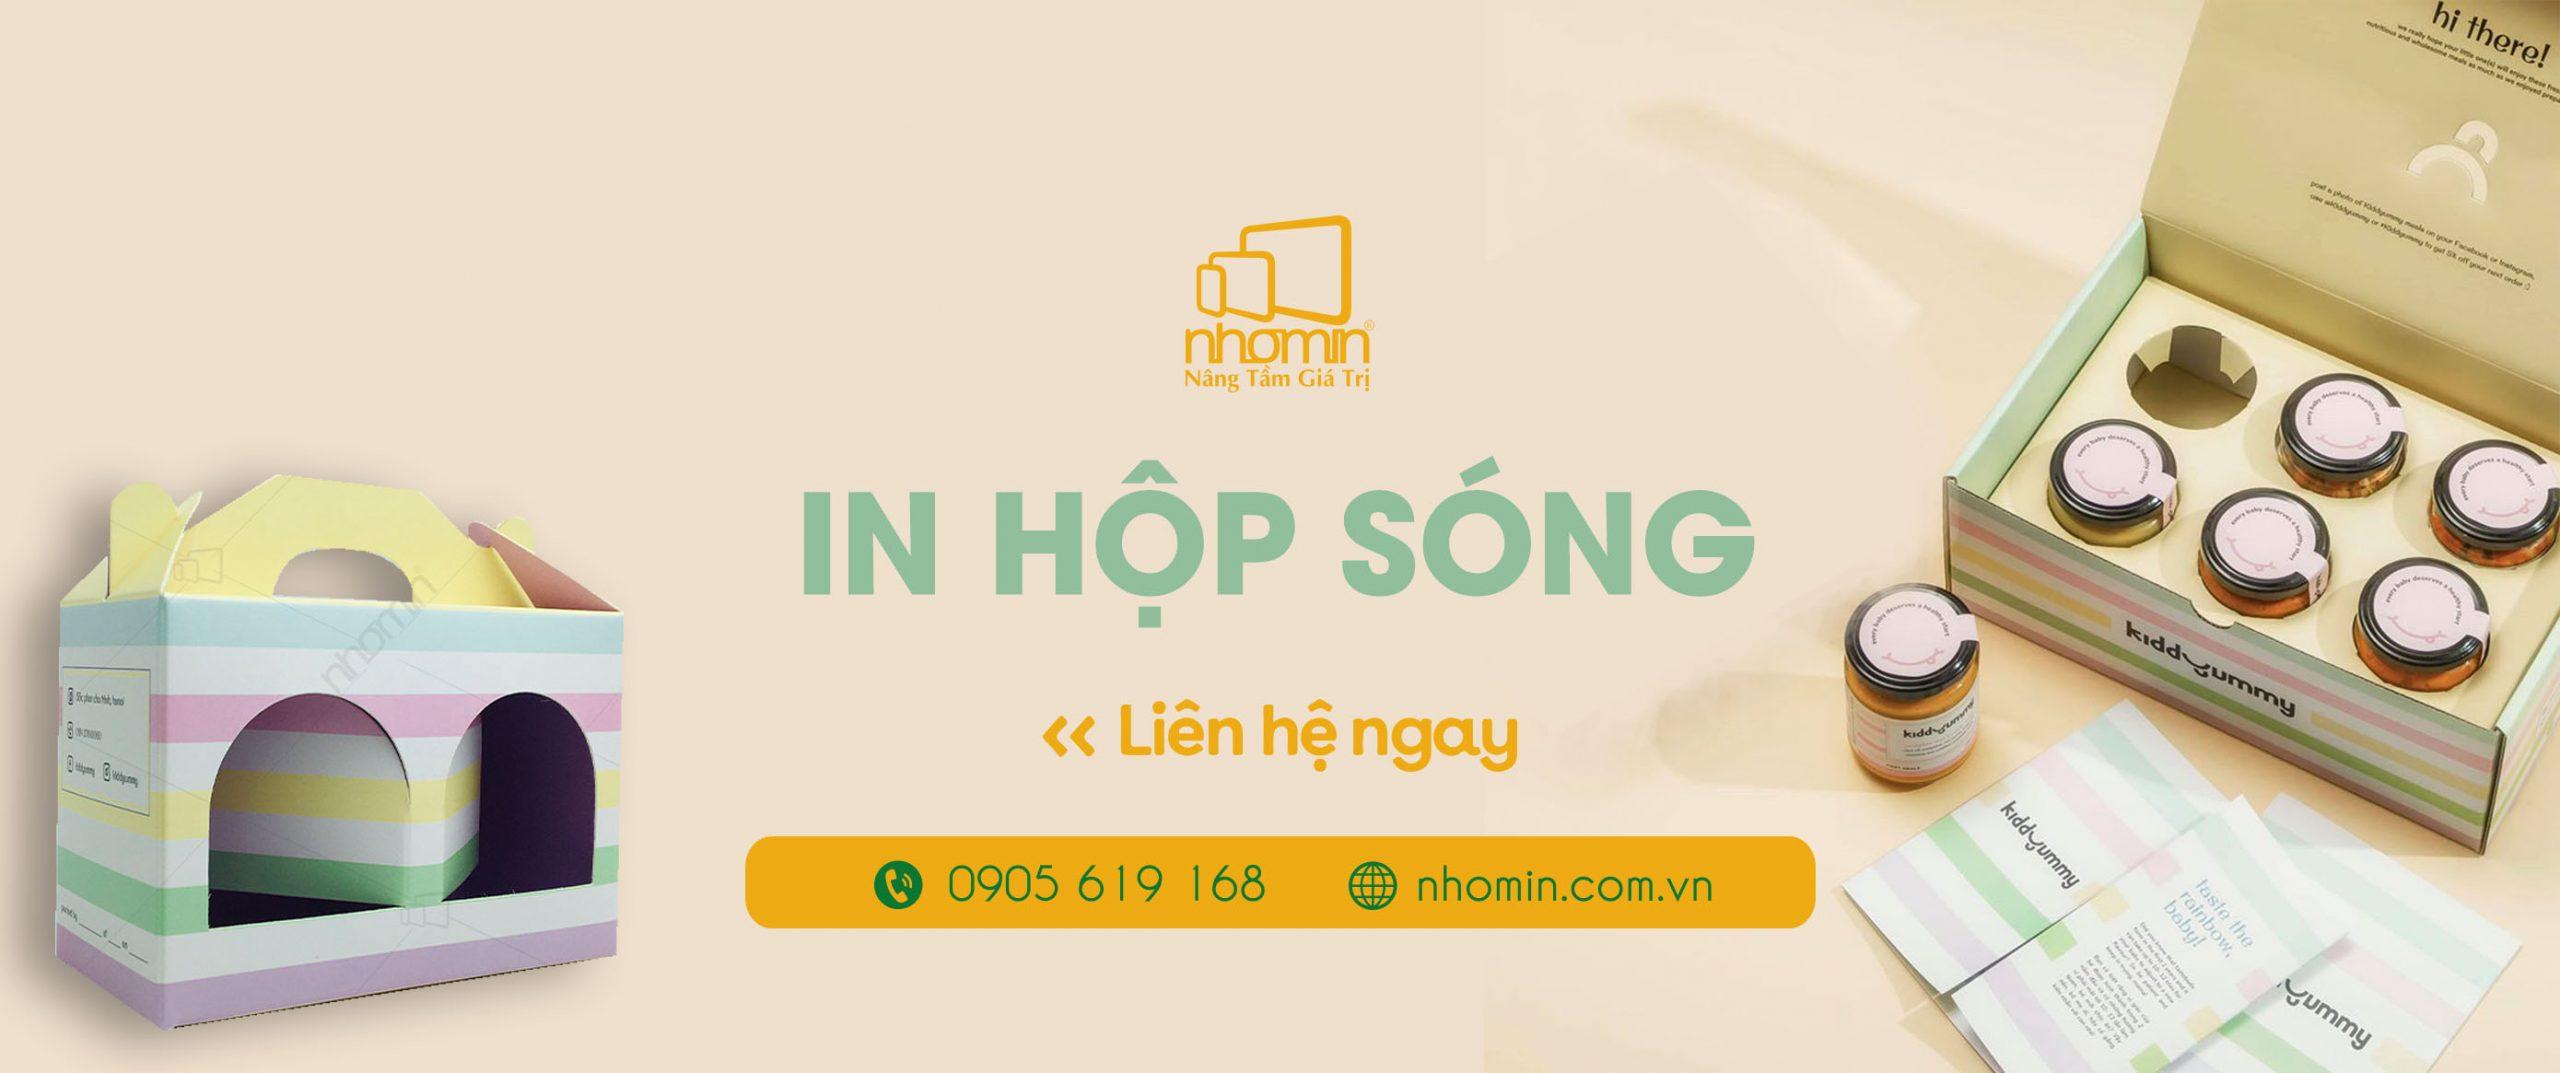 in-hop-song-nhom-in